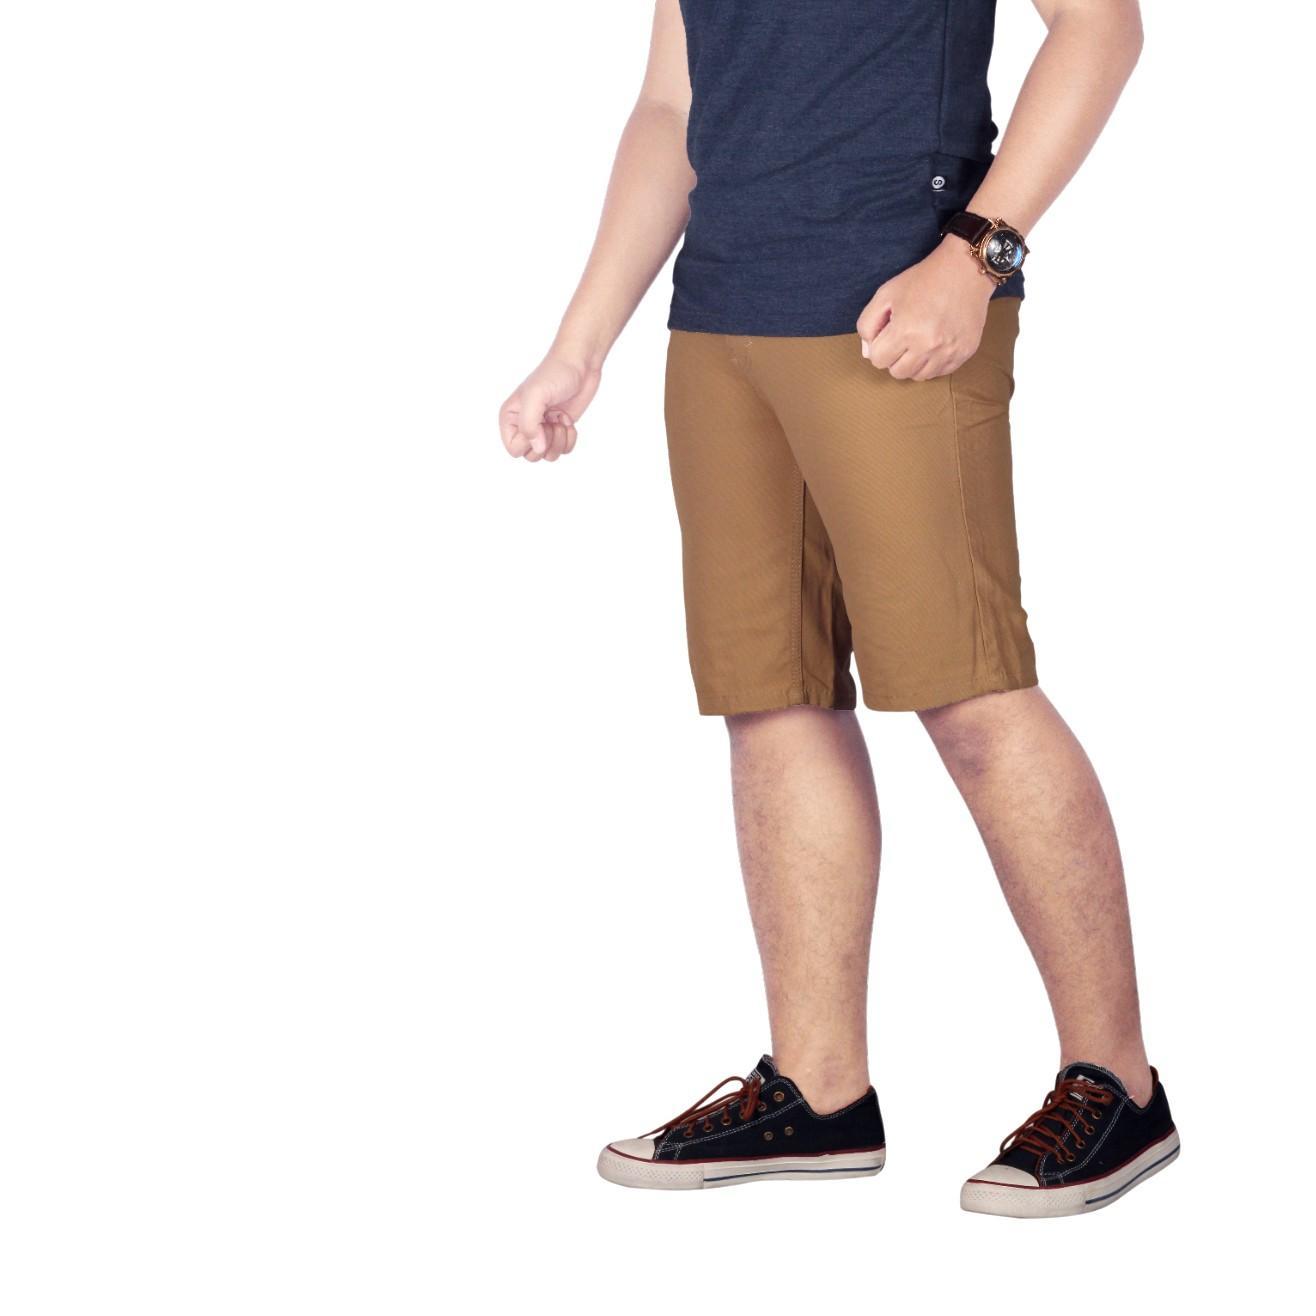 Kelebihan Crs Celana Panjang Pria Distro Chino Zr Htam Bsg Fashion1 Import Pendek Pendekcelana Chinos